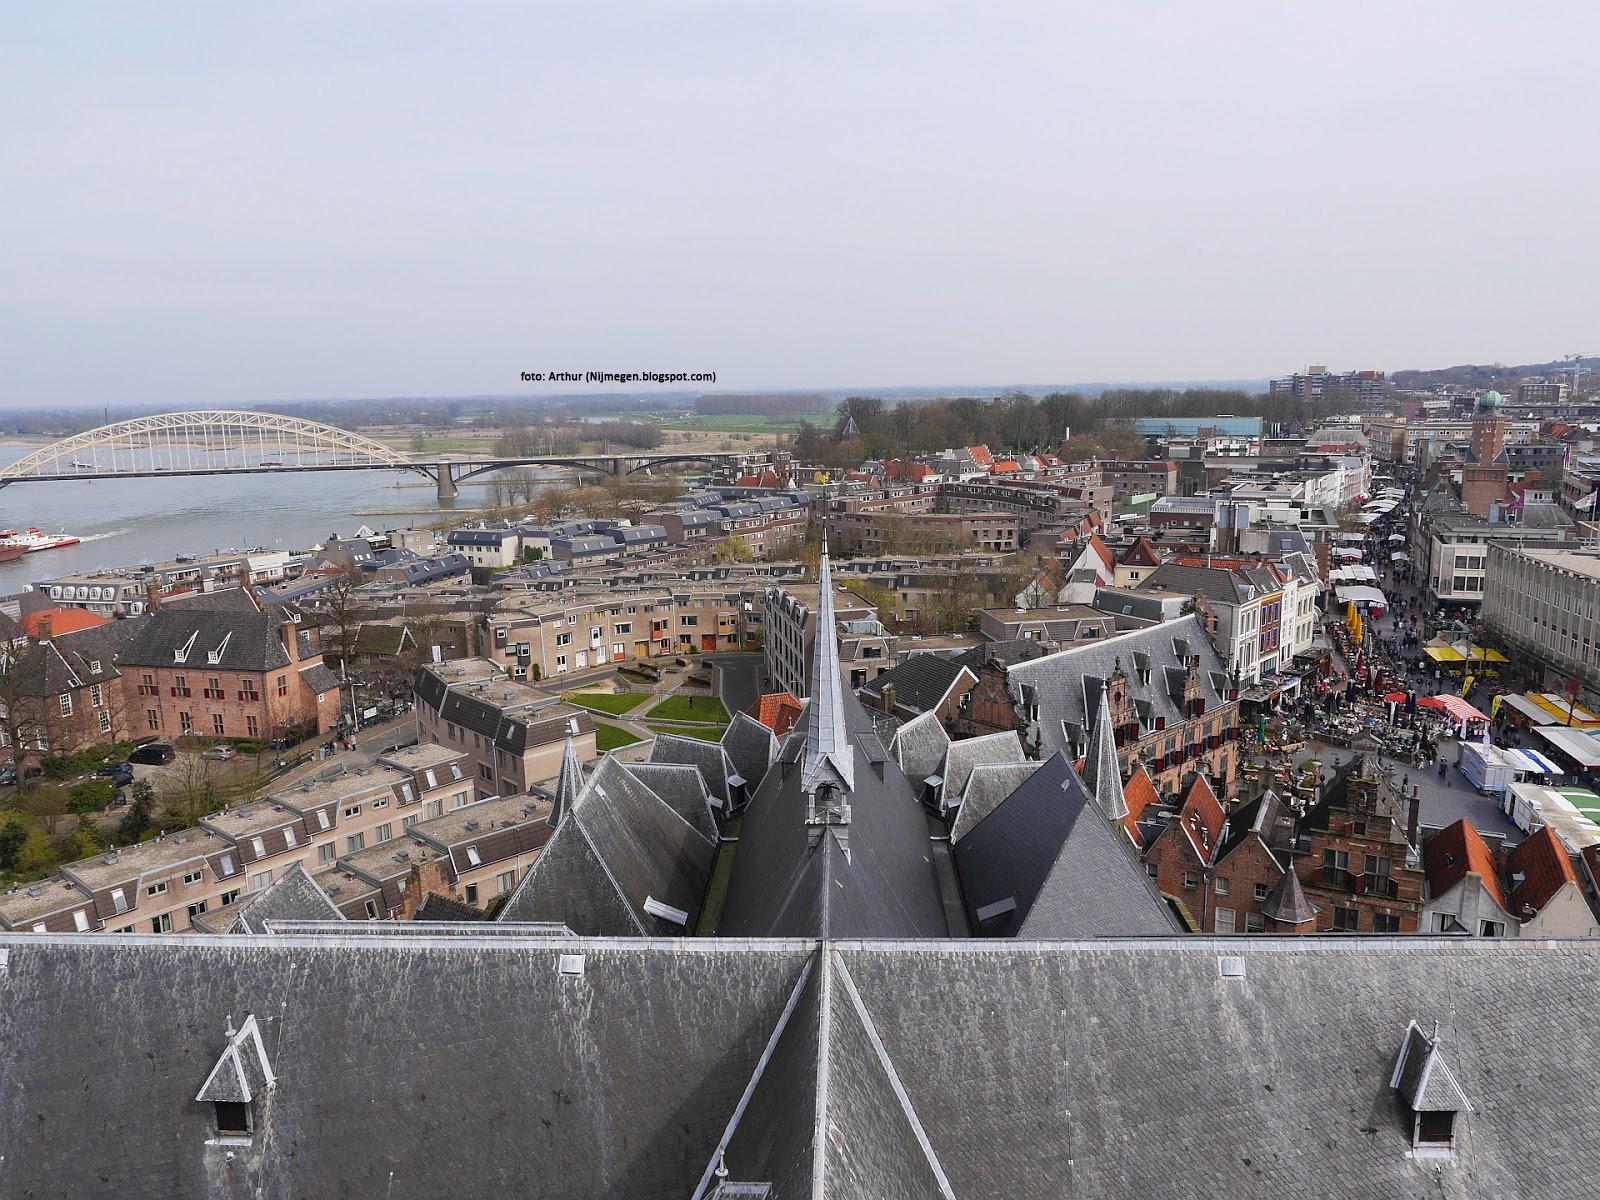 Bewonerscomité Benedenstad Nijmegen